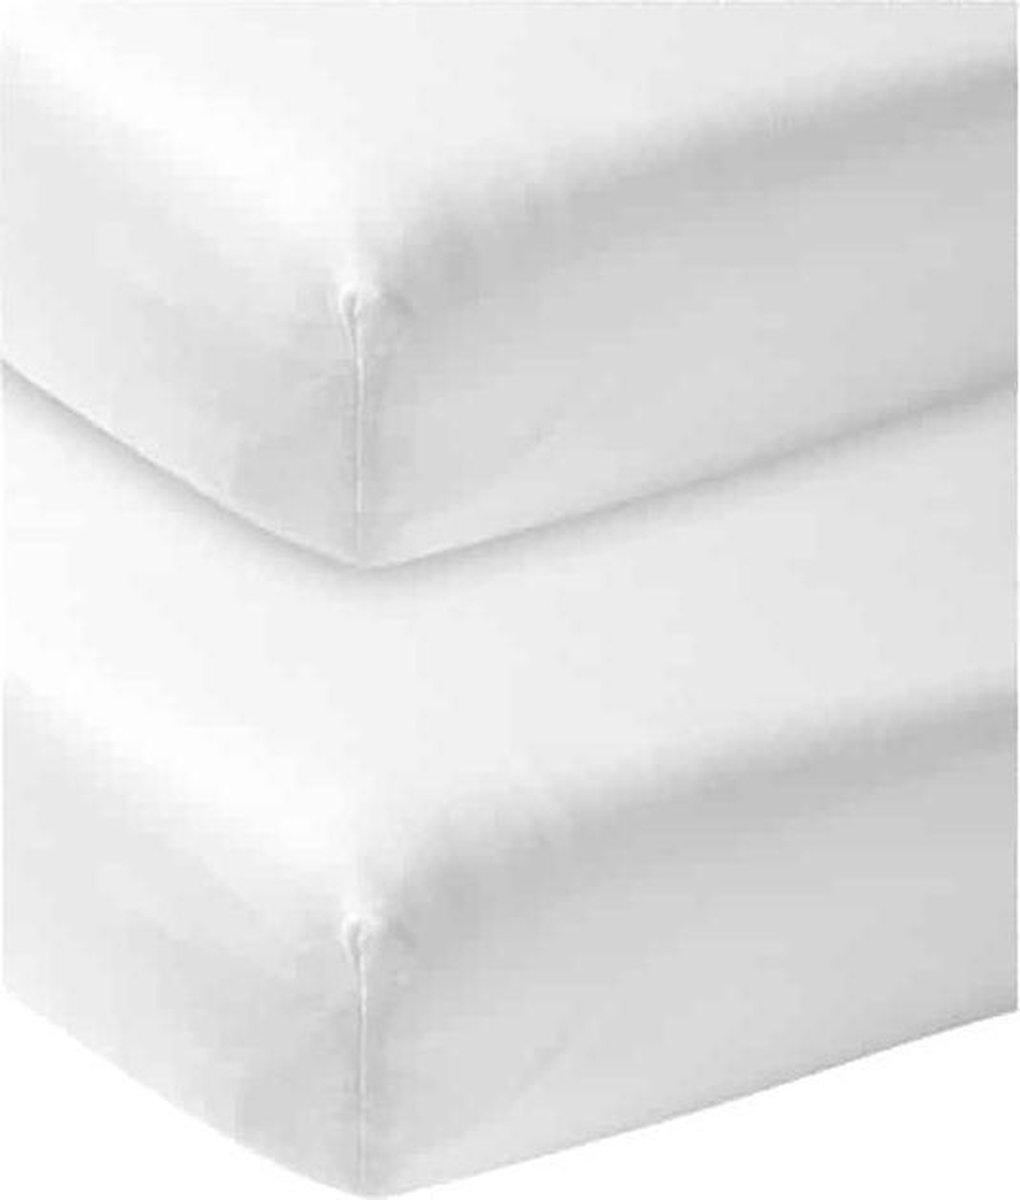 Meyco jersey hoeslaken - 2-pack - wit 40x80/90